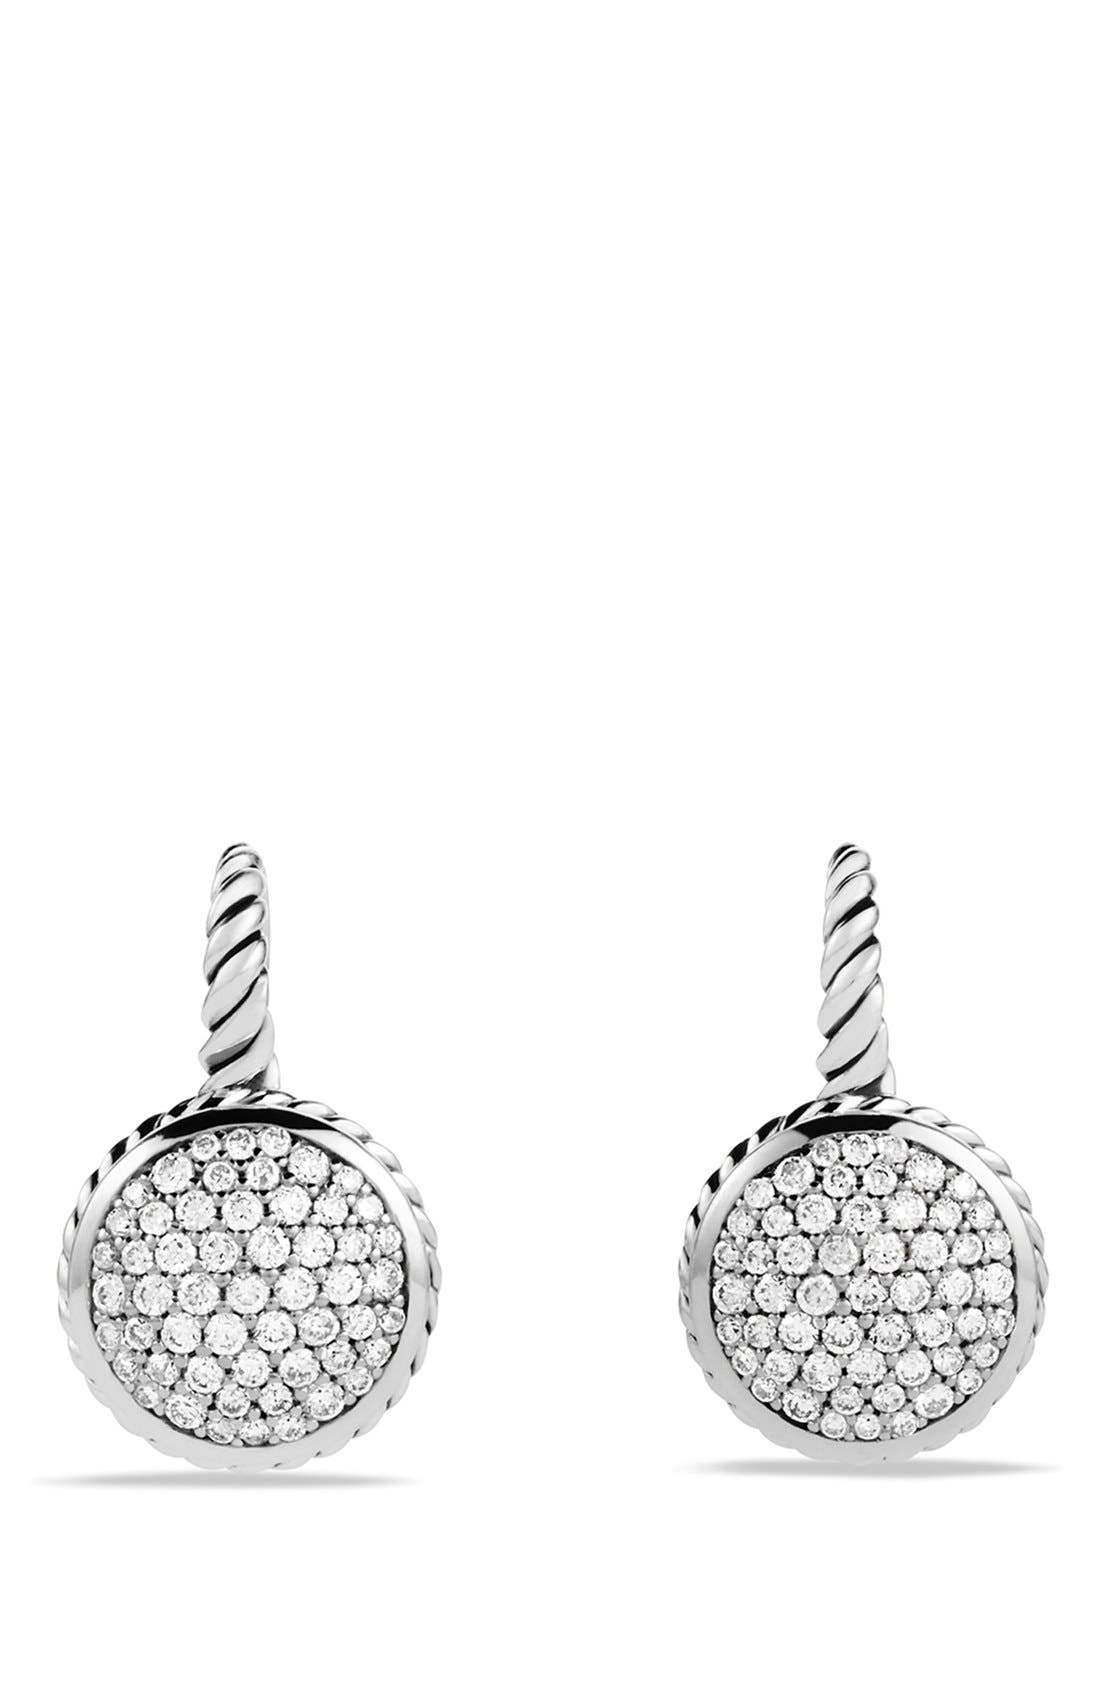 Alternate Image 1 Selected - David Yurman Pavé Drop Earrings with Diamonds